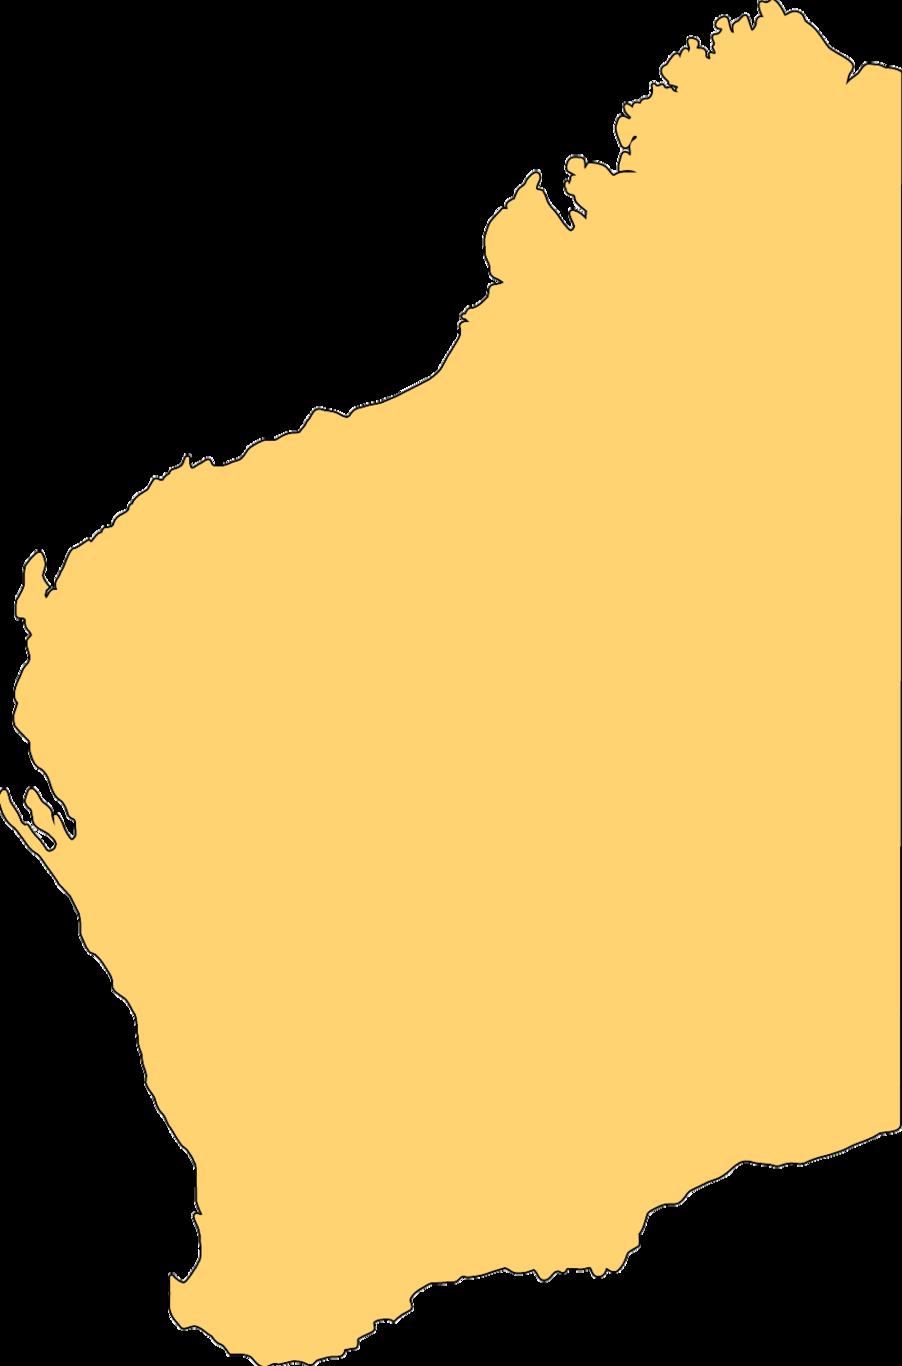 Blank Map Of Western Australia Mapsof Clipart.